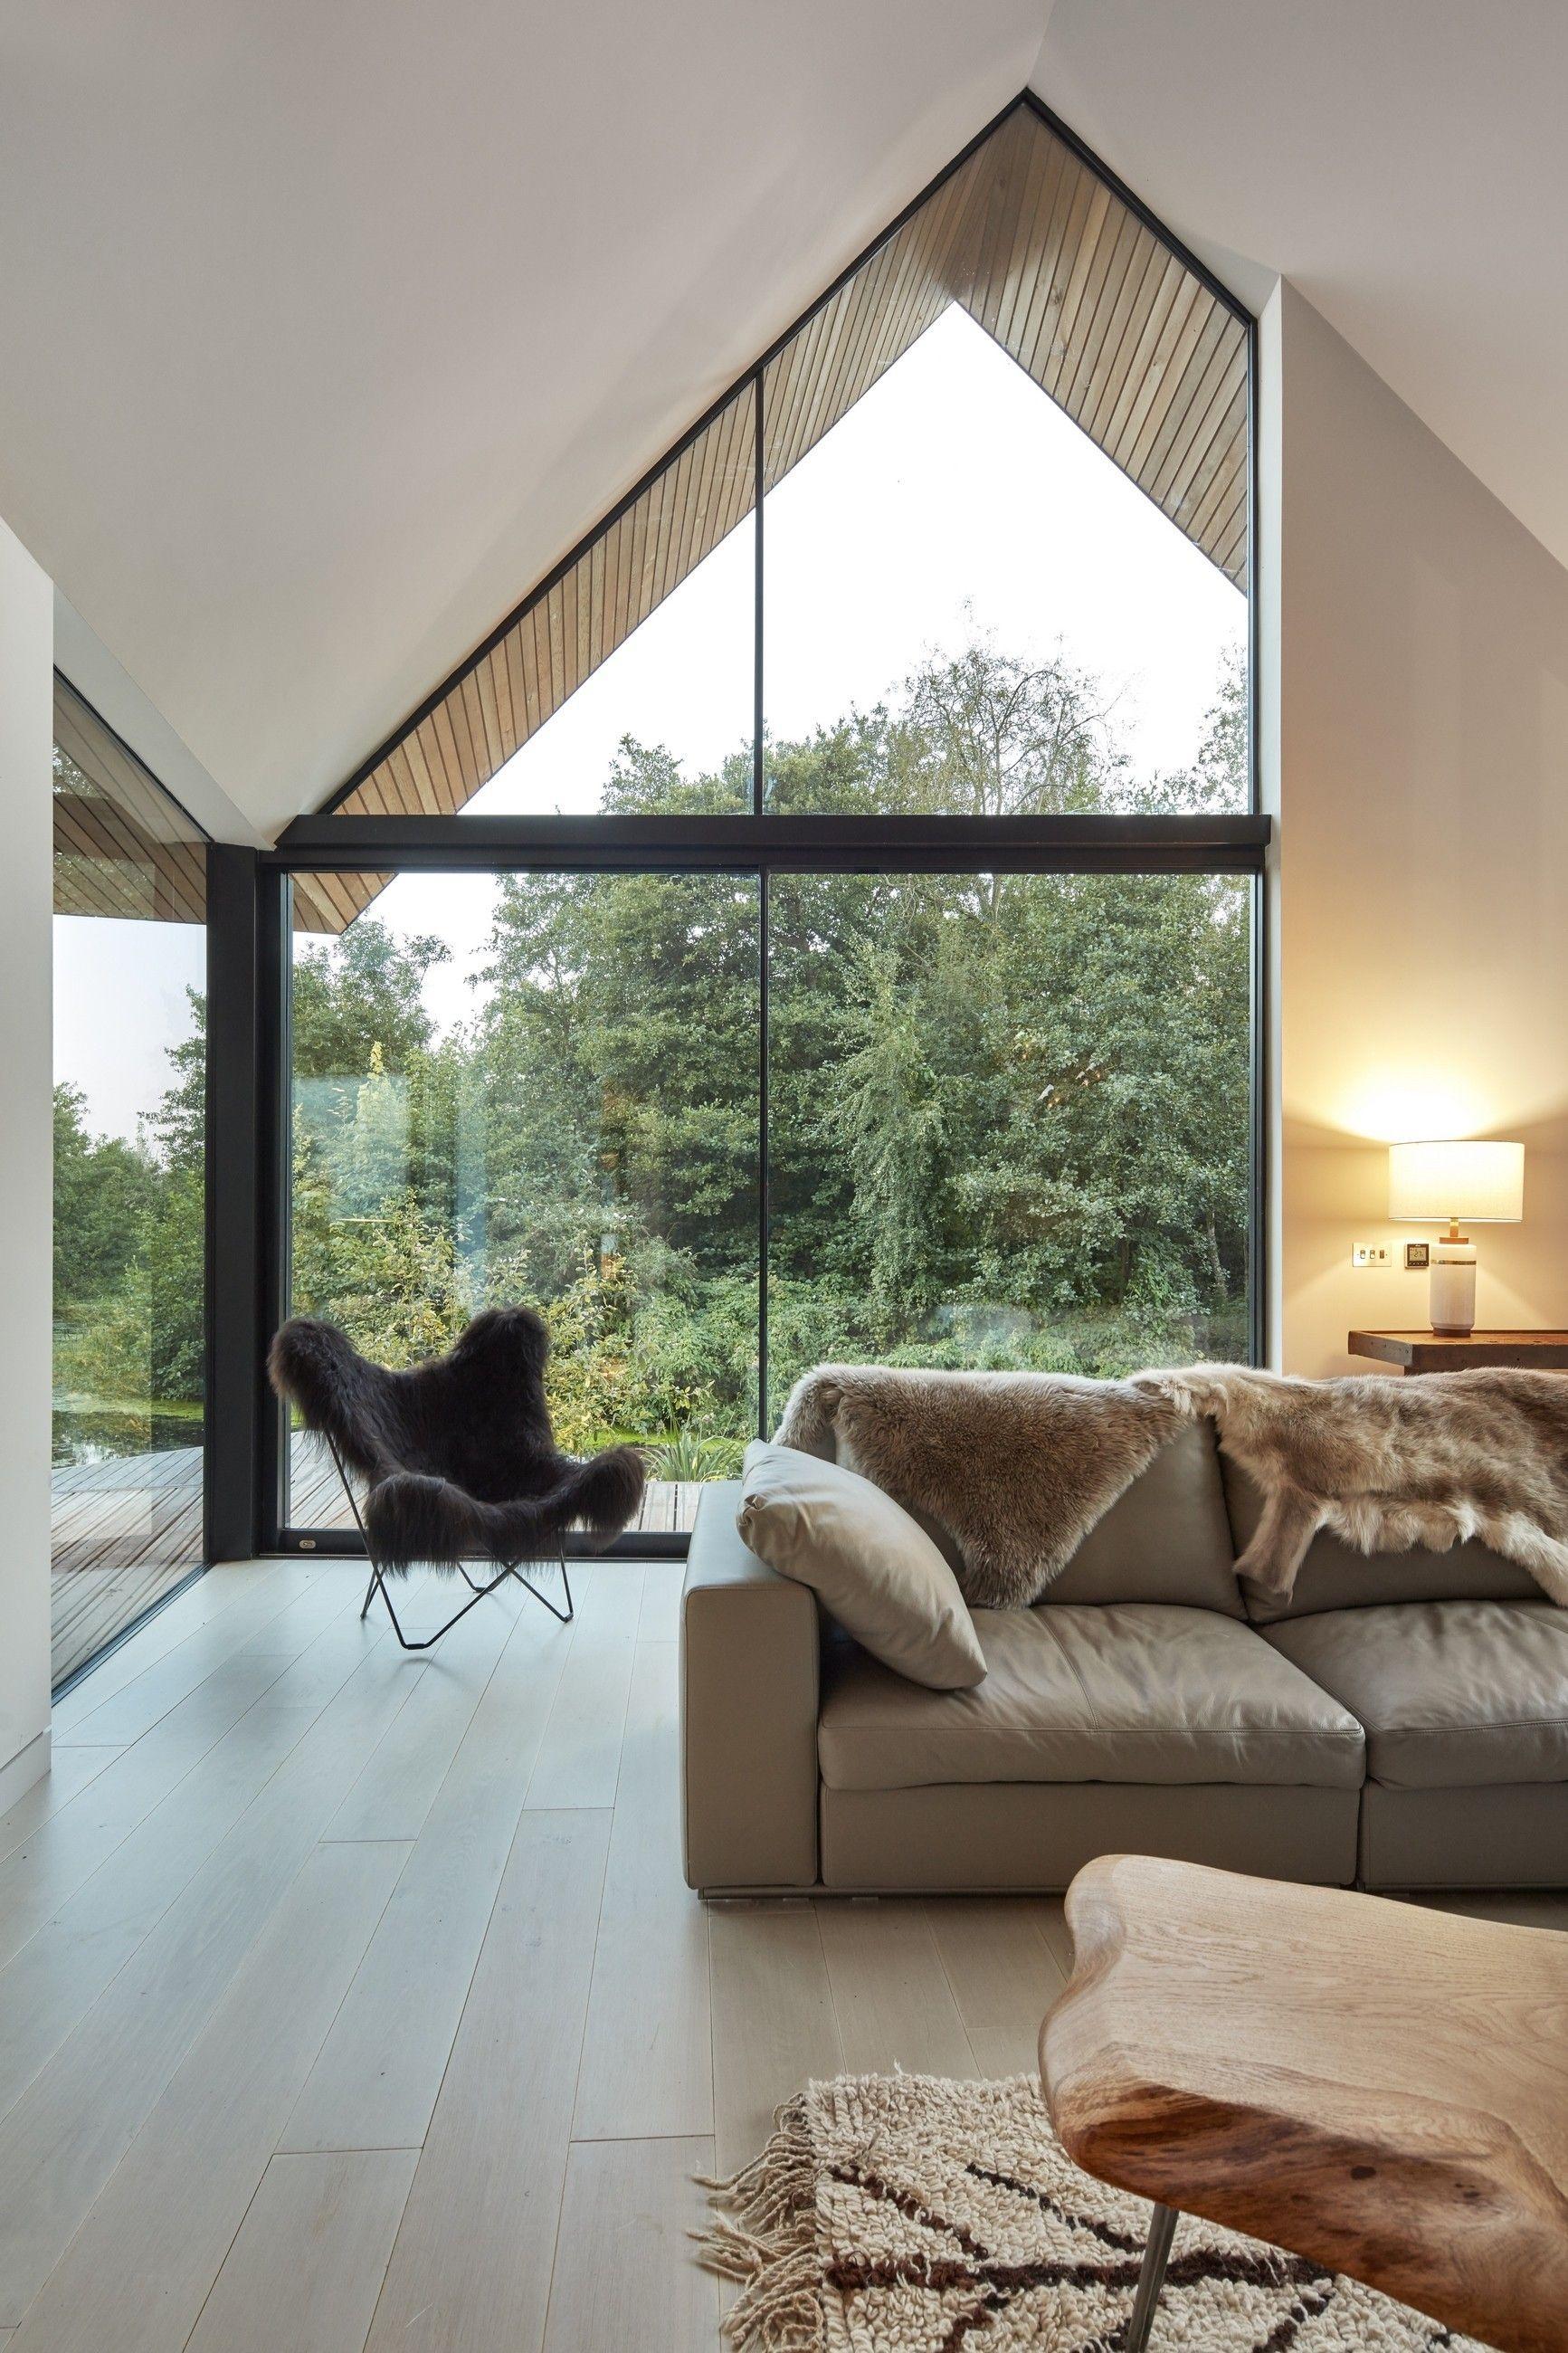 Nem Lehetne Tokeletesebb Ez Az Angol Toparti Haz Az Online Ferfimagazin Huis Ontwerpen Huis Interieur Architectuur Huis